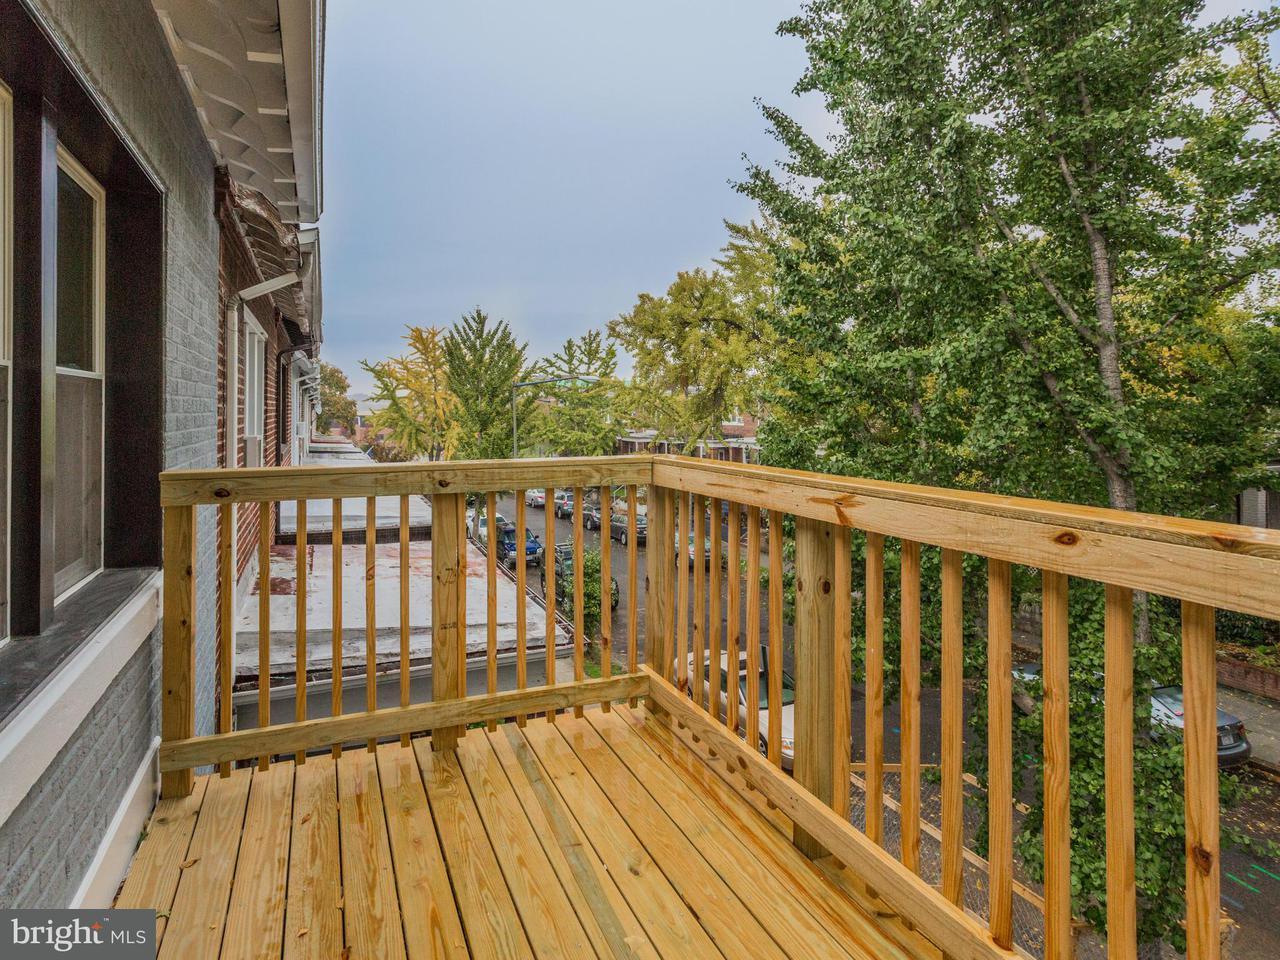 Additional photo for property listing at 1818 Burke St Se 1818 Burke St Se Washington, Distretto Di Columbia 20003 Stati Uniti